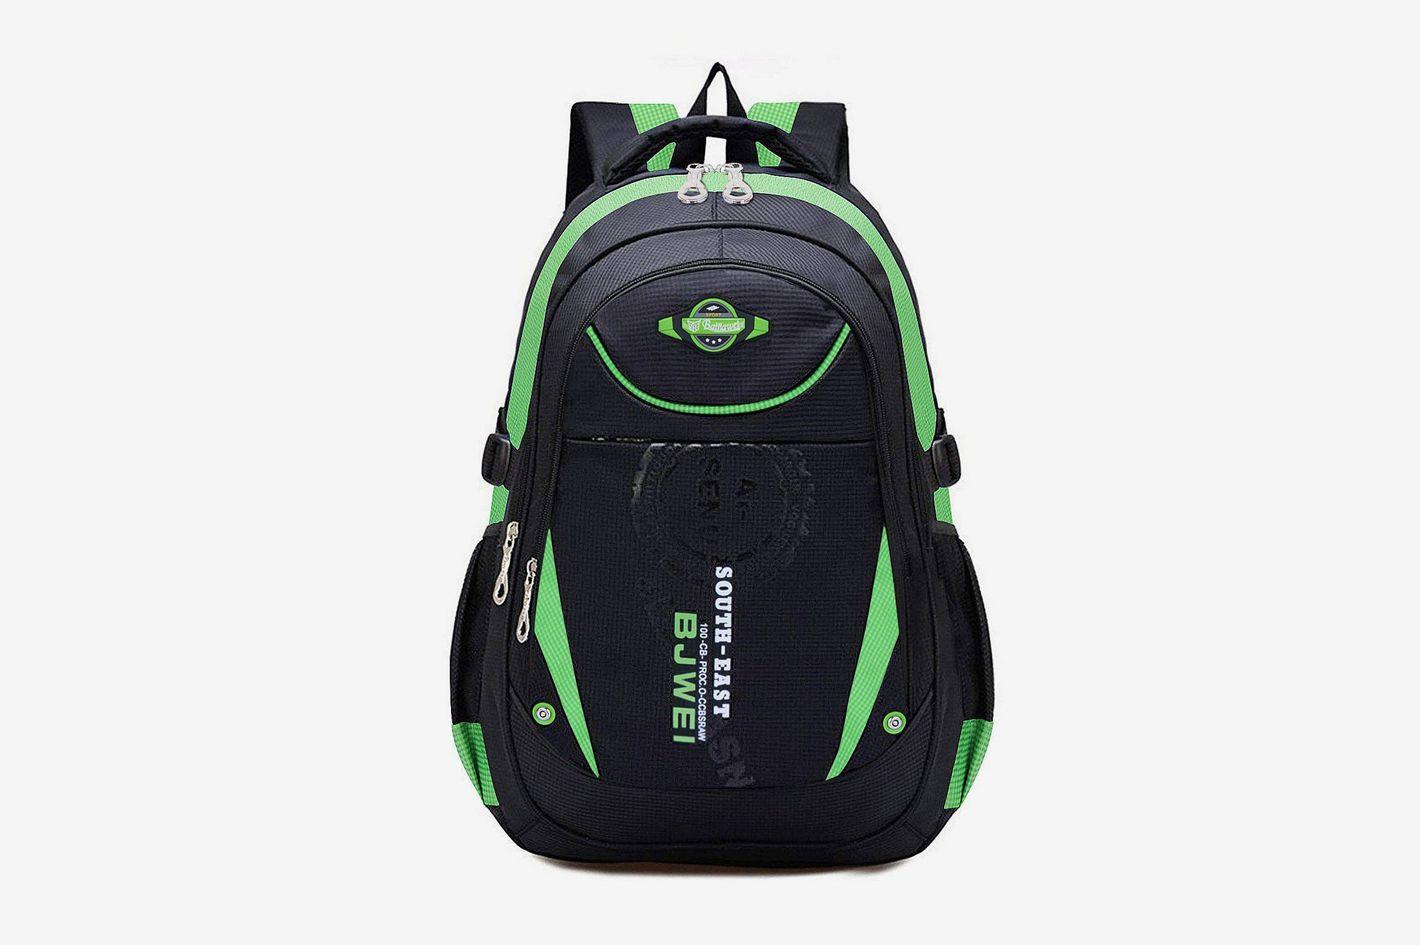 MAYZERO Waterproof School Bag